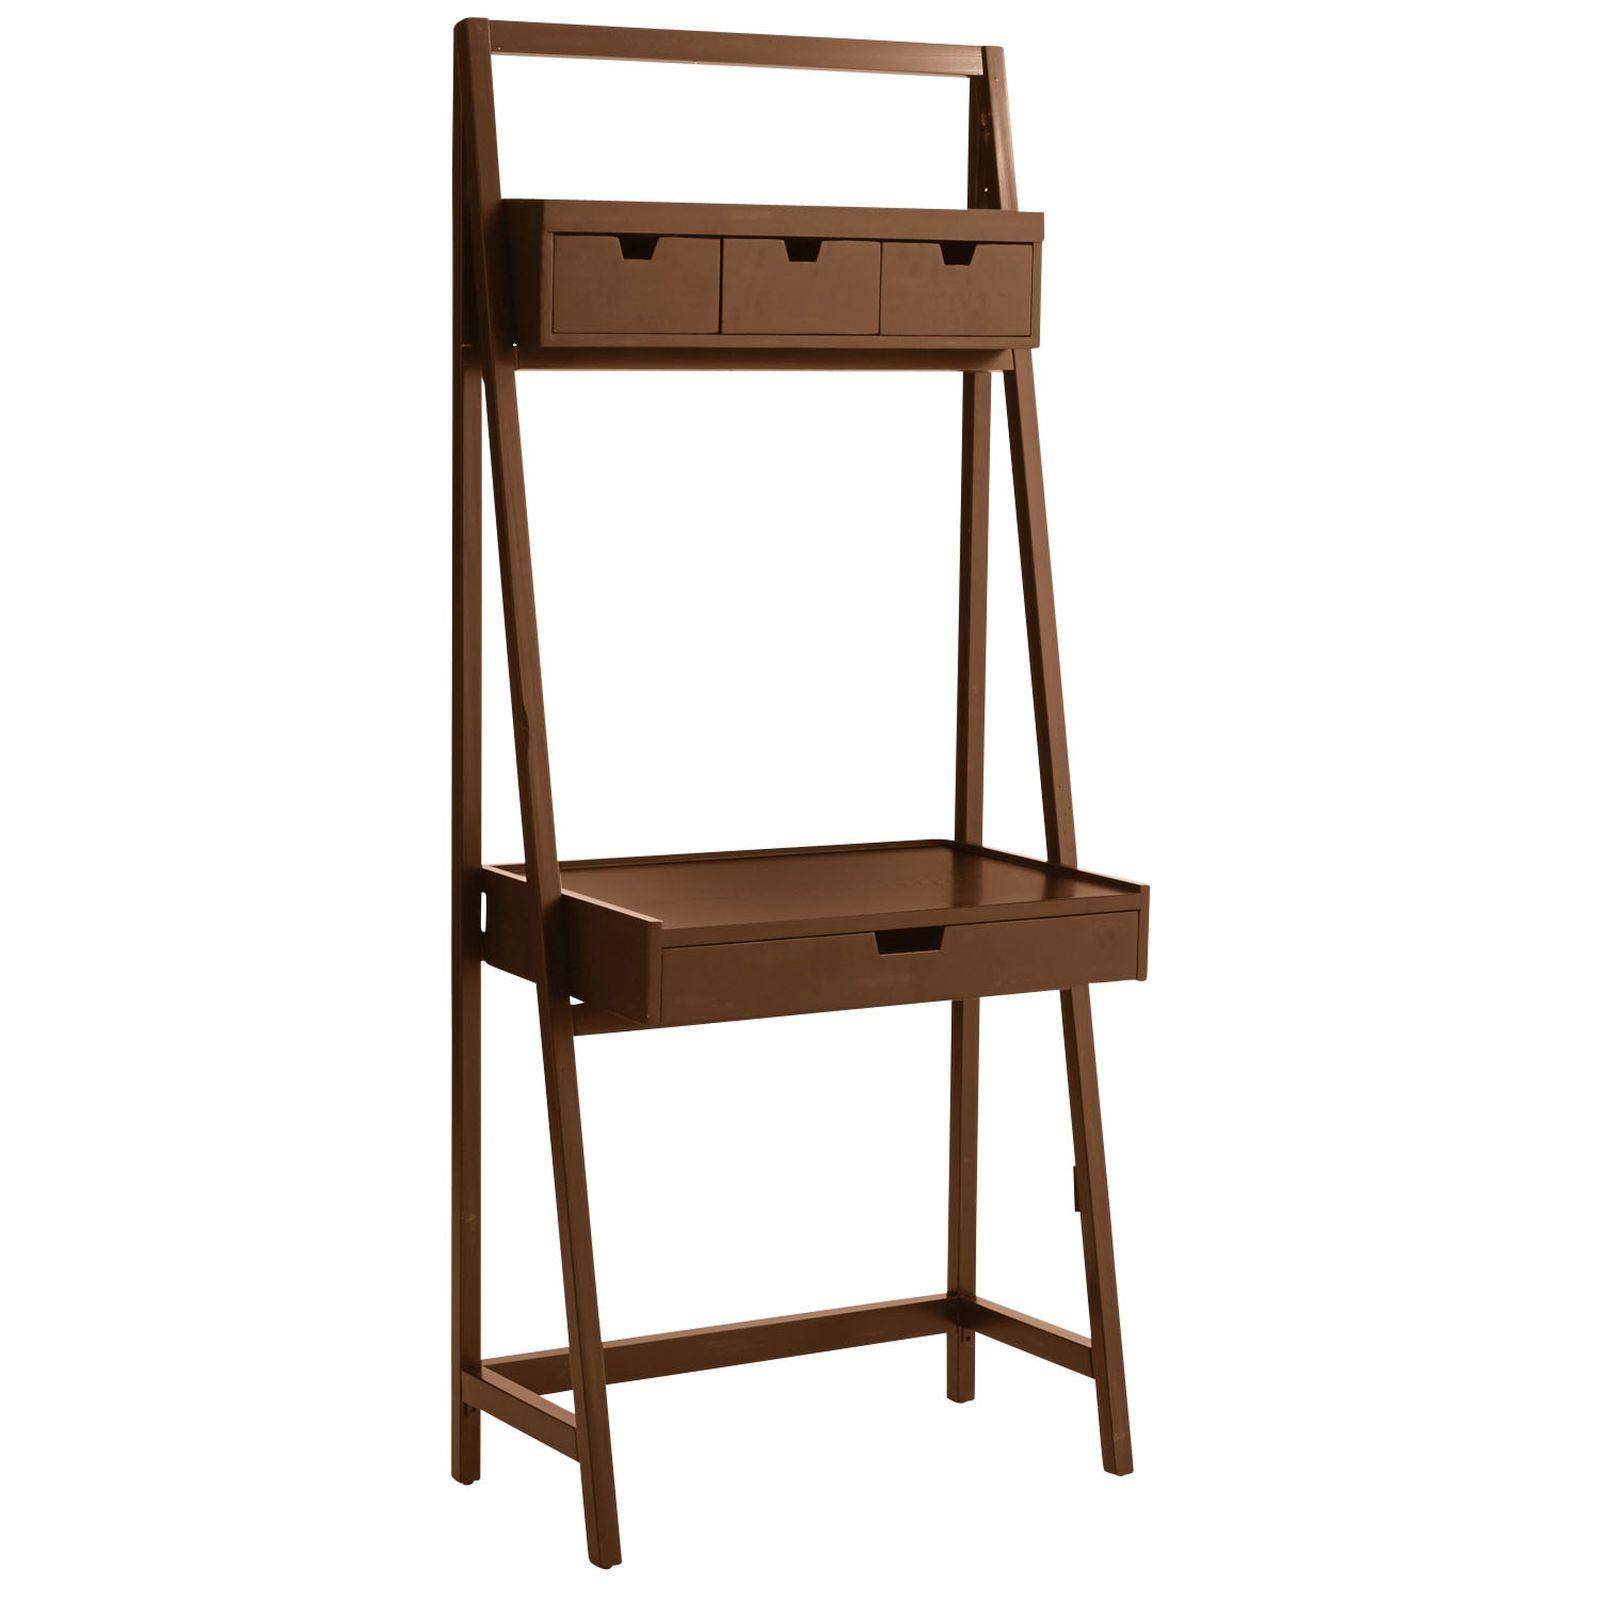 morgan tuscan brown desk we all dream pinterest desks drawers rh pinterest com pier 1 desk furniture pier 1 small desks